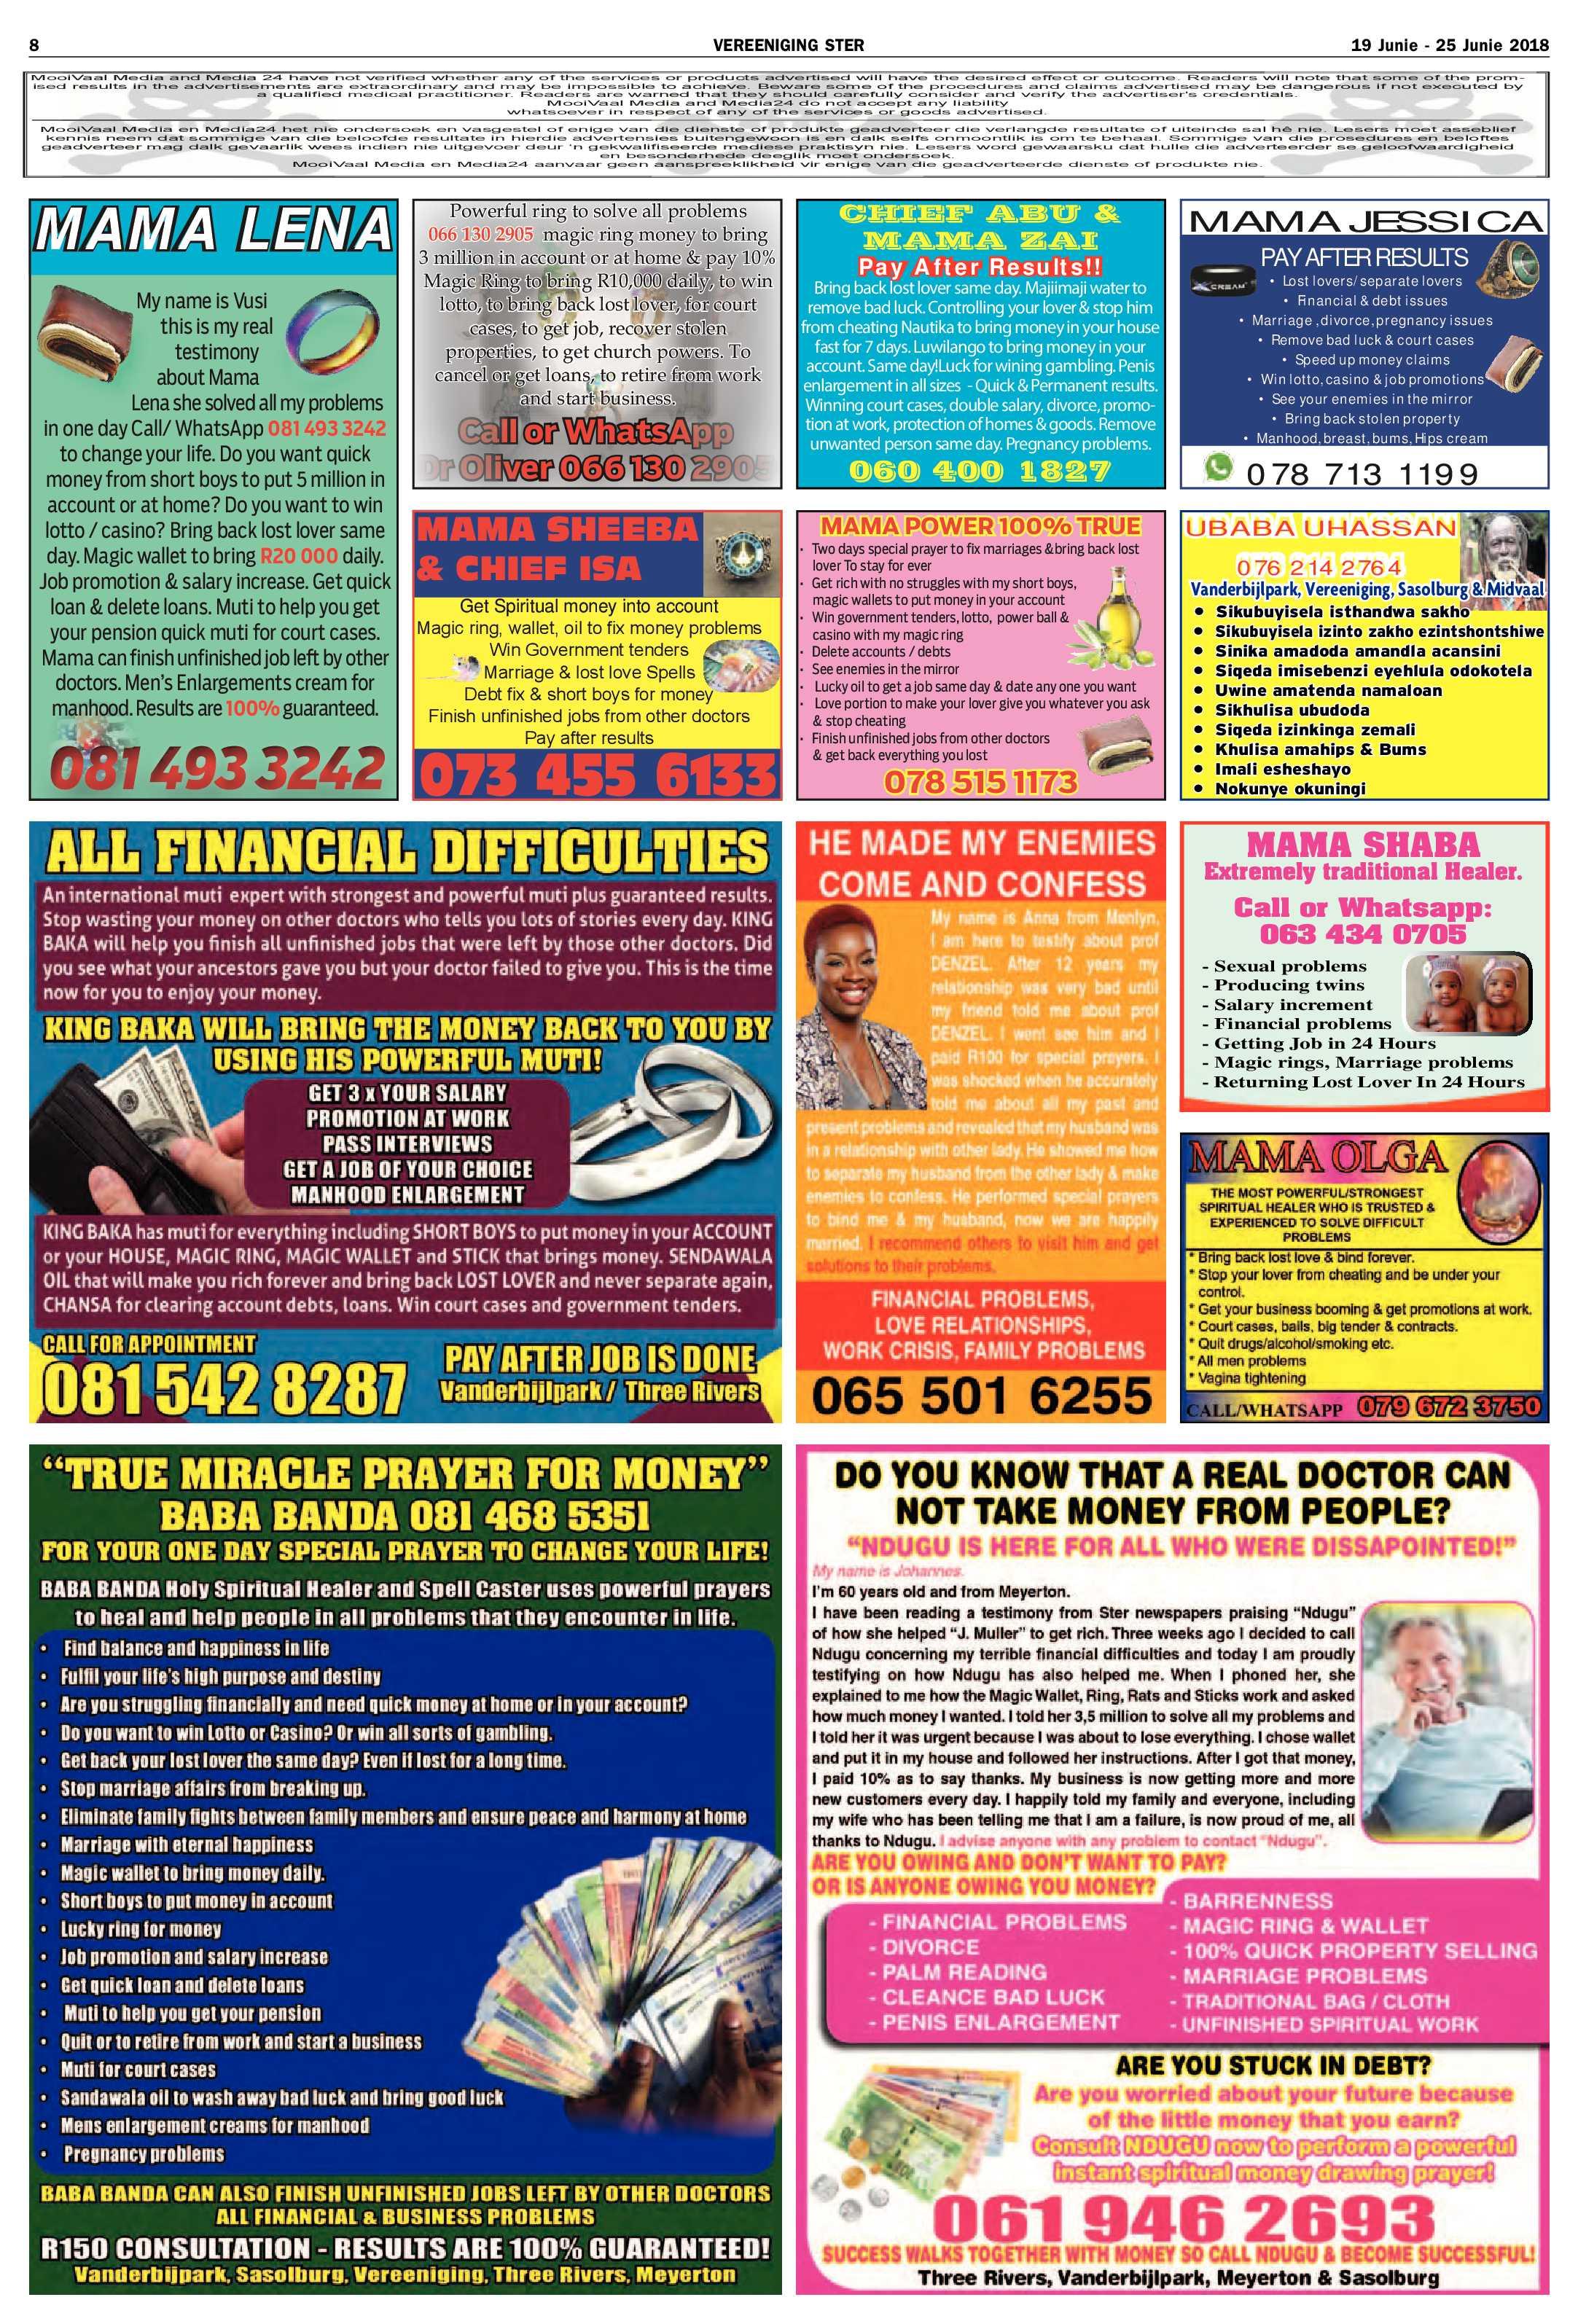 Vereeniging Ster 19 - 25 Junie 2018 - vaalweekblad